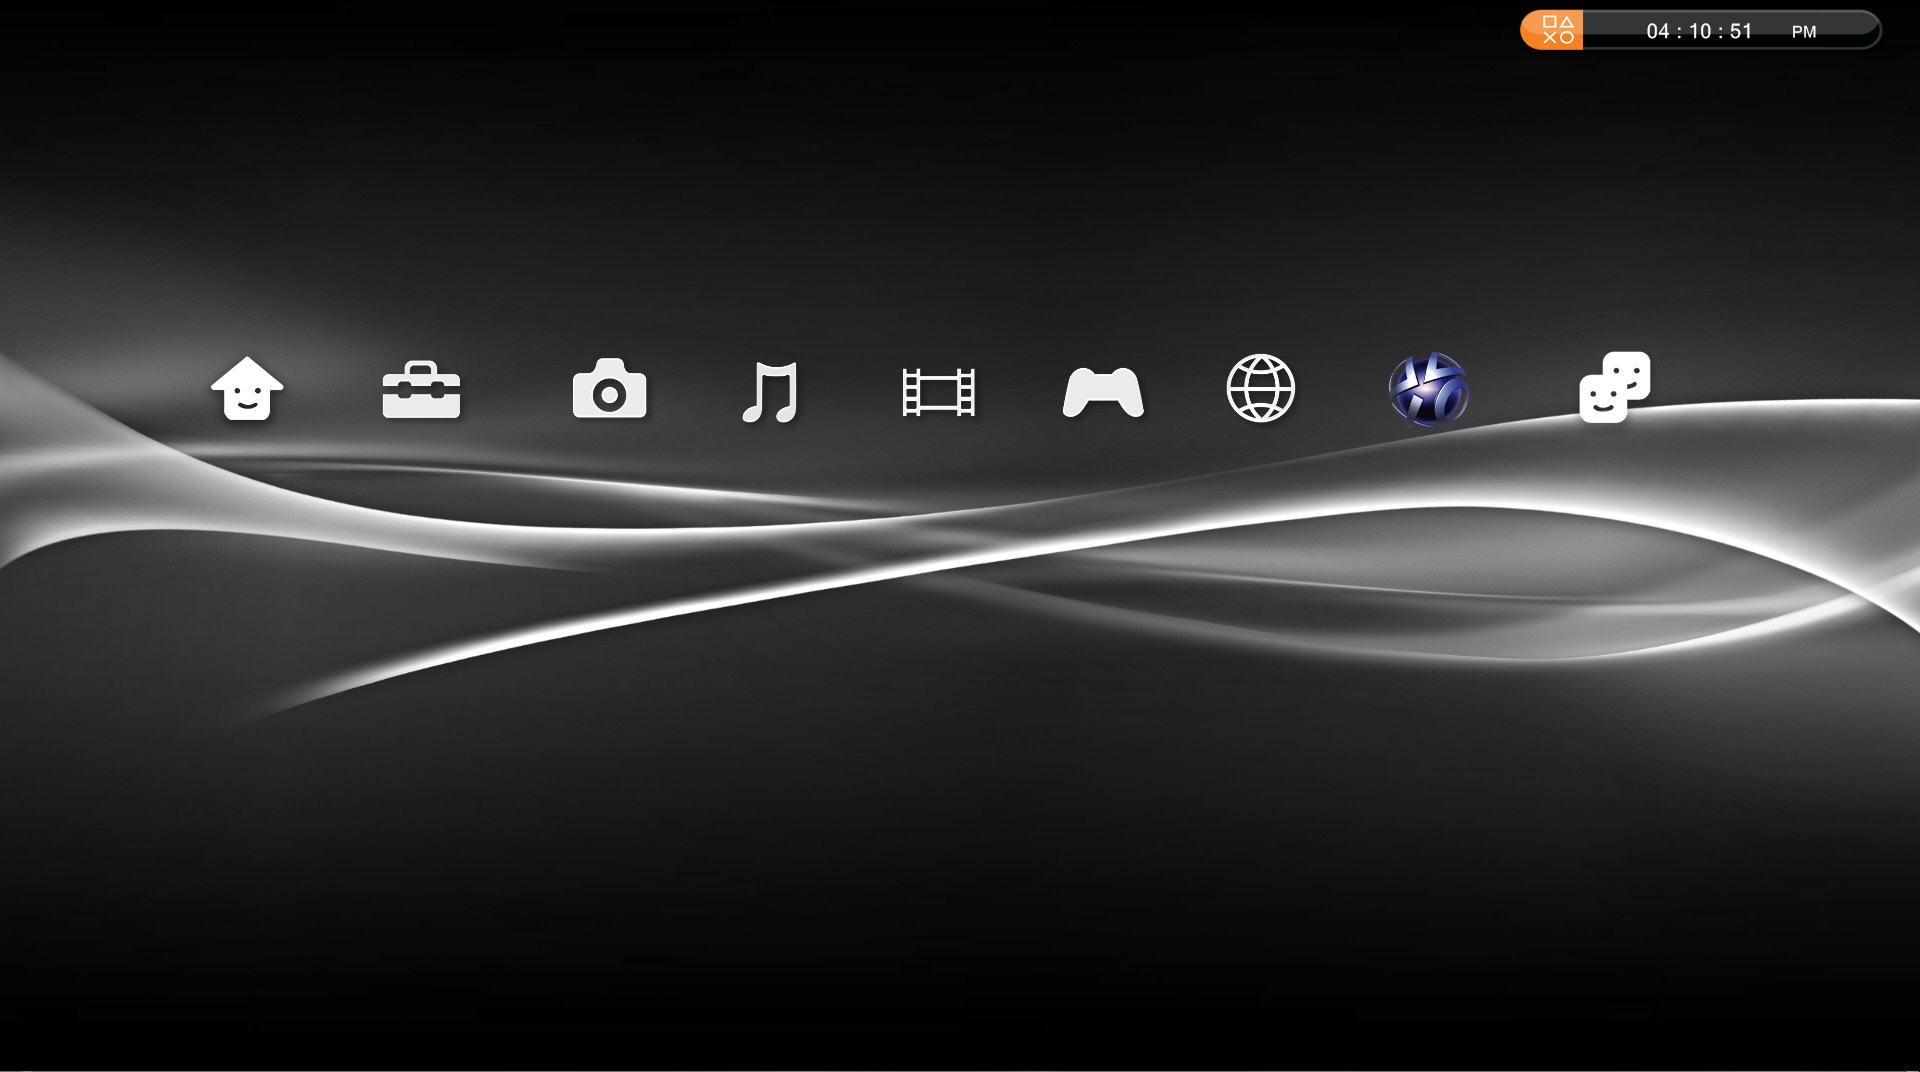 Complete Black Wallpaper Ps3 Gui For Your Desktop Pc By Jmr101 On Deviantart